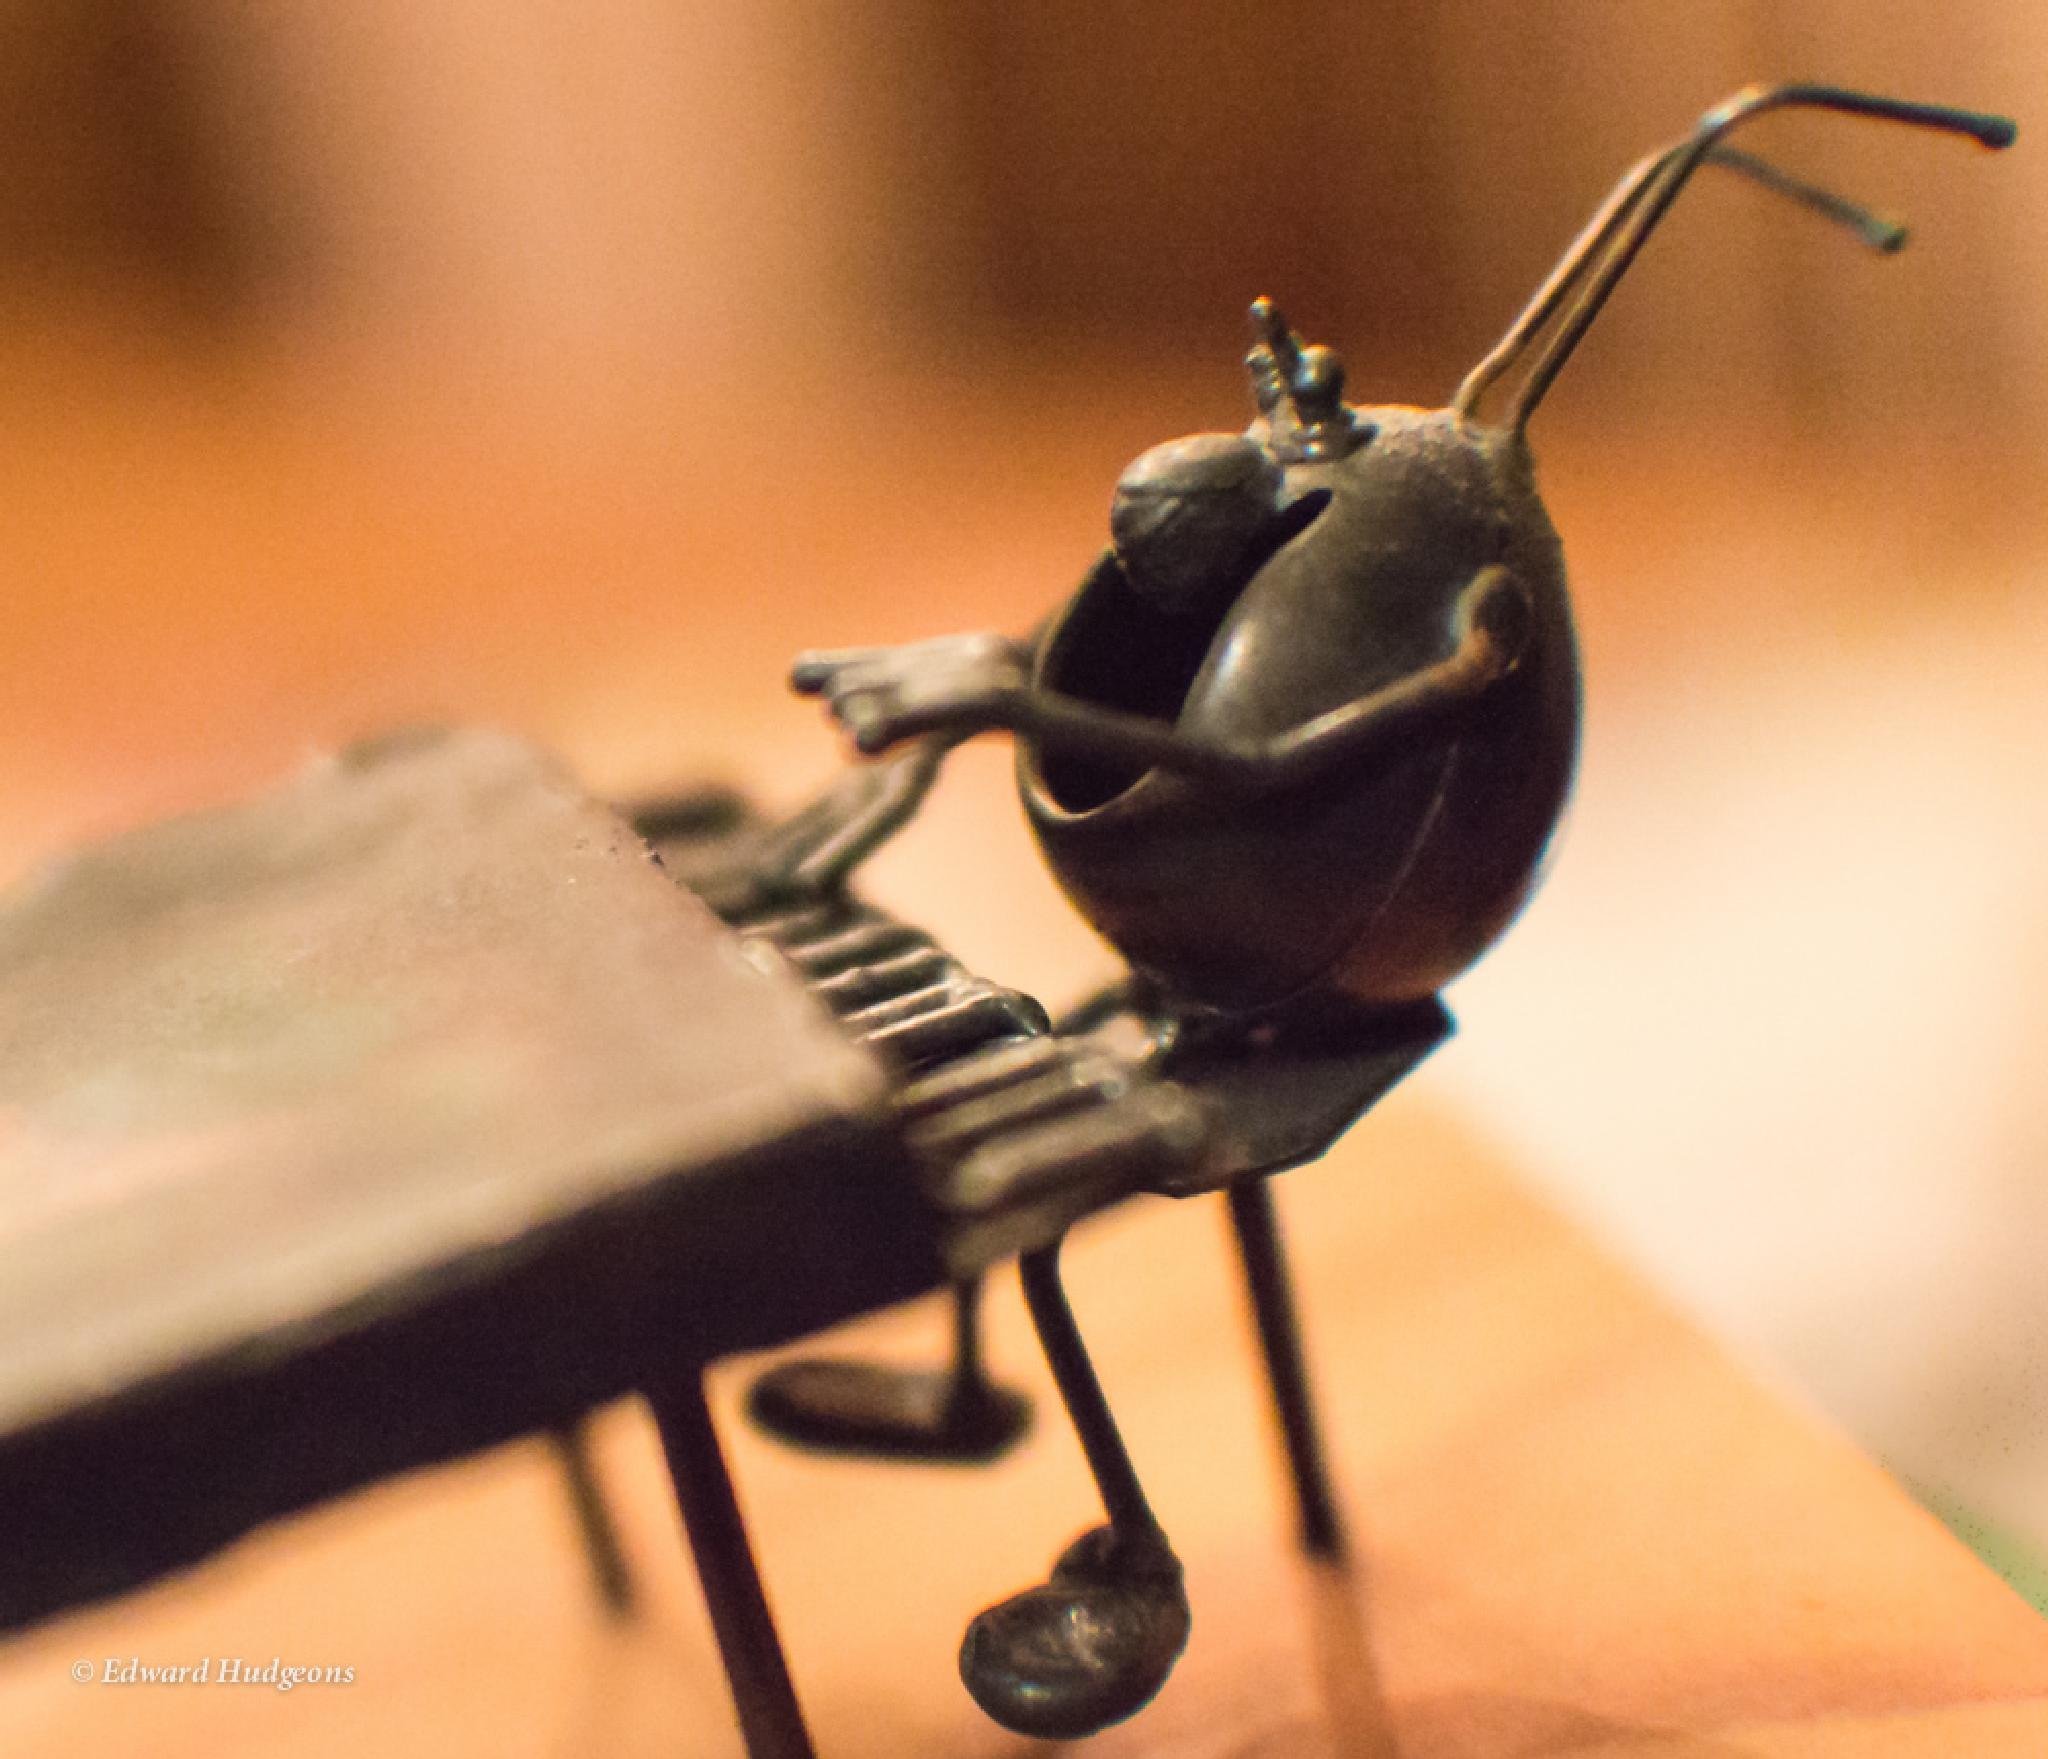 Pianoman 2 by Edward Hudgeons